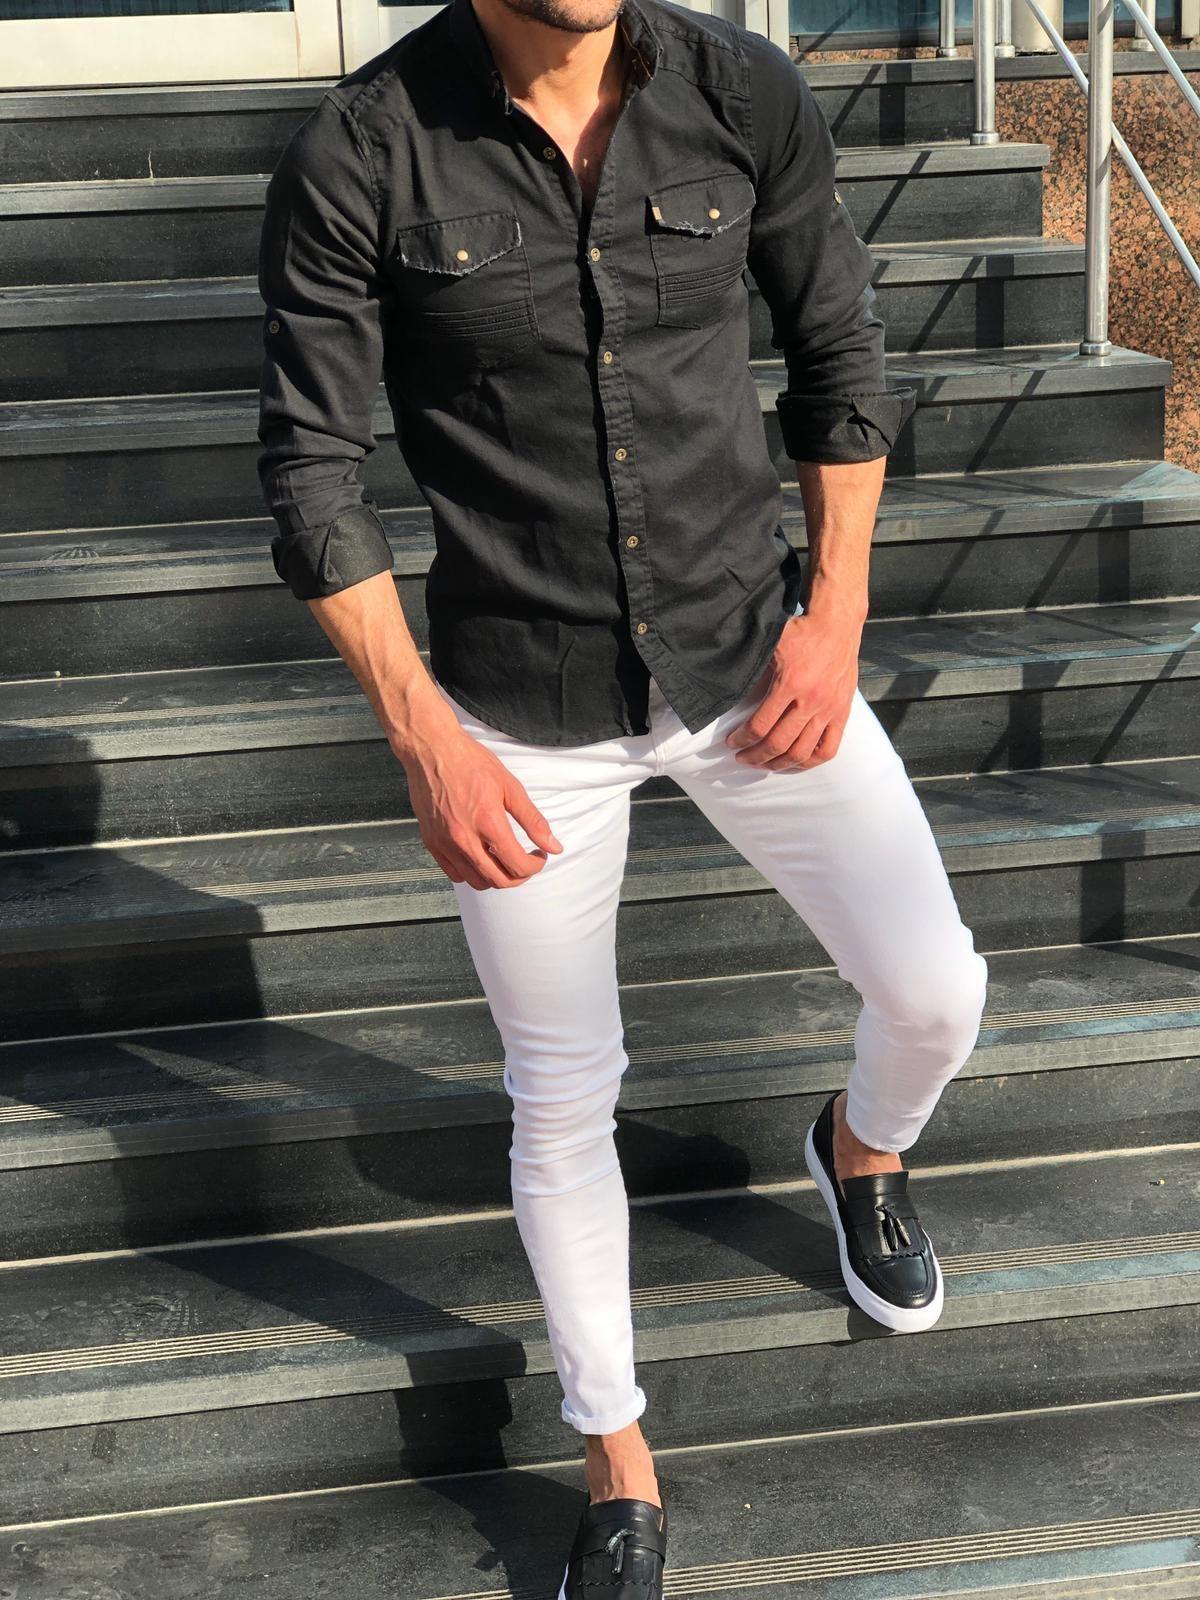 Dansenoff Slim Fit Denim Shirt 4 Colors Bojoni Black Shirt Outfit Men Mens Pants Fashion Shirt Outfit Men [ 1600 x 1200 Pixel ]